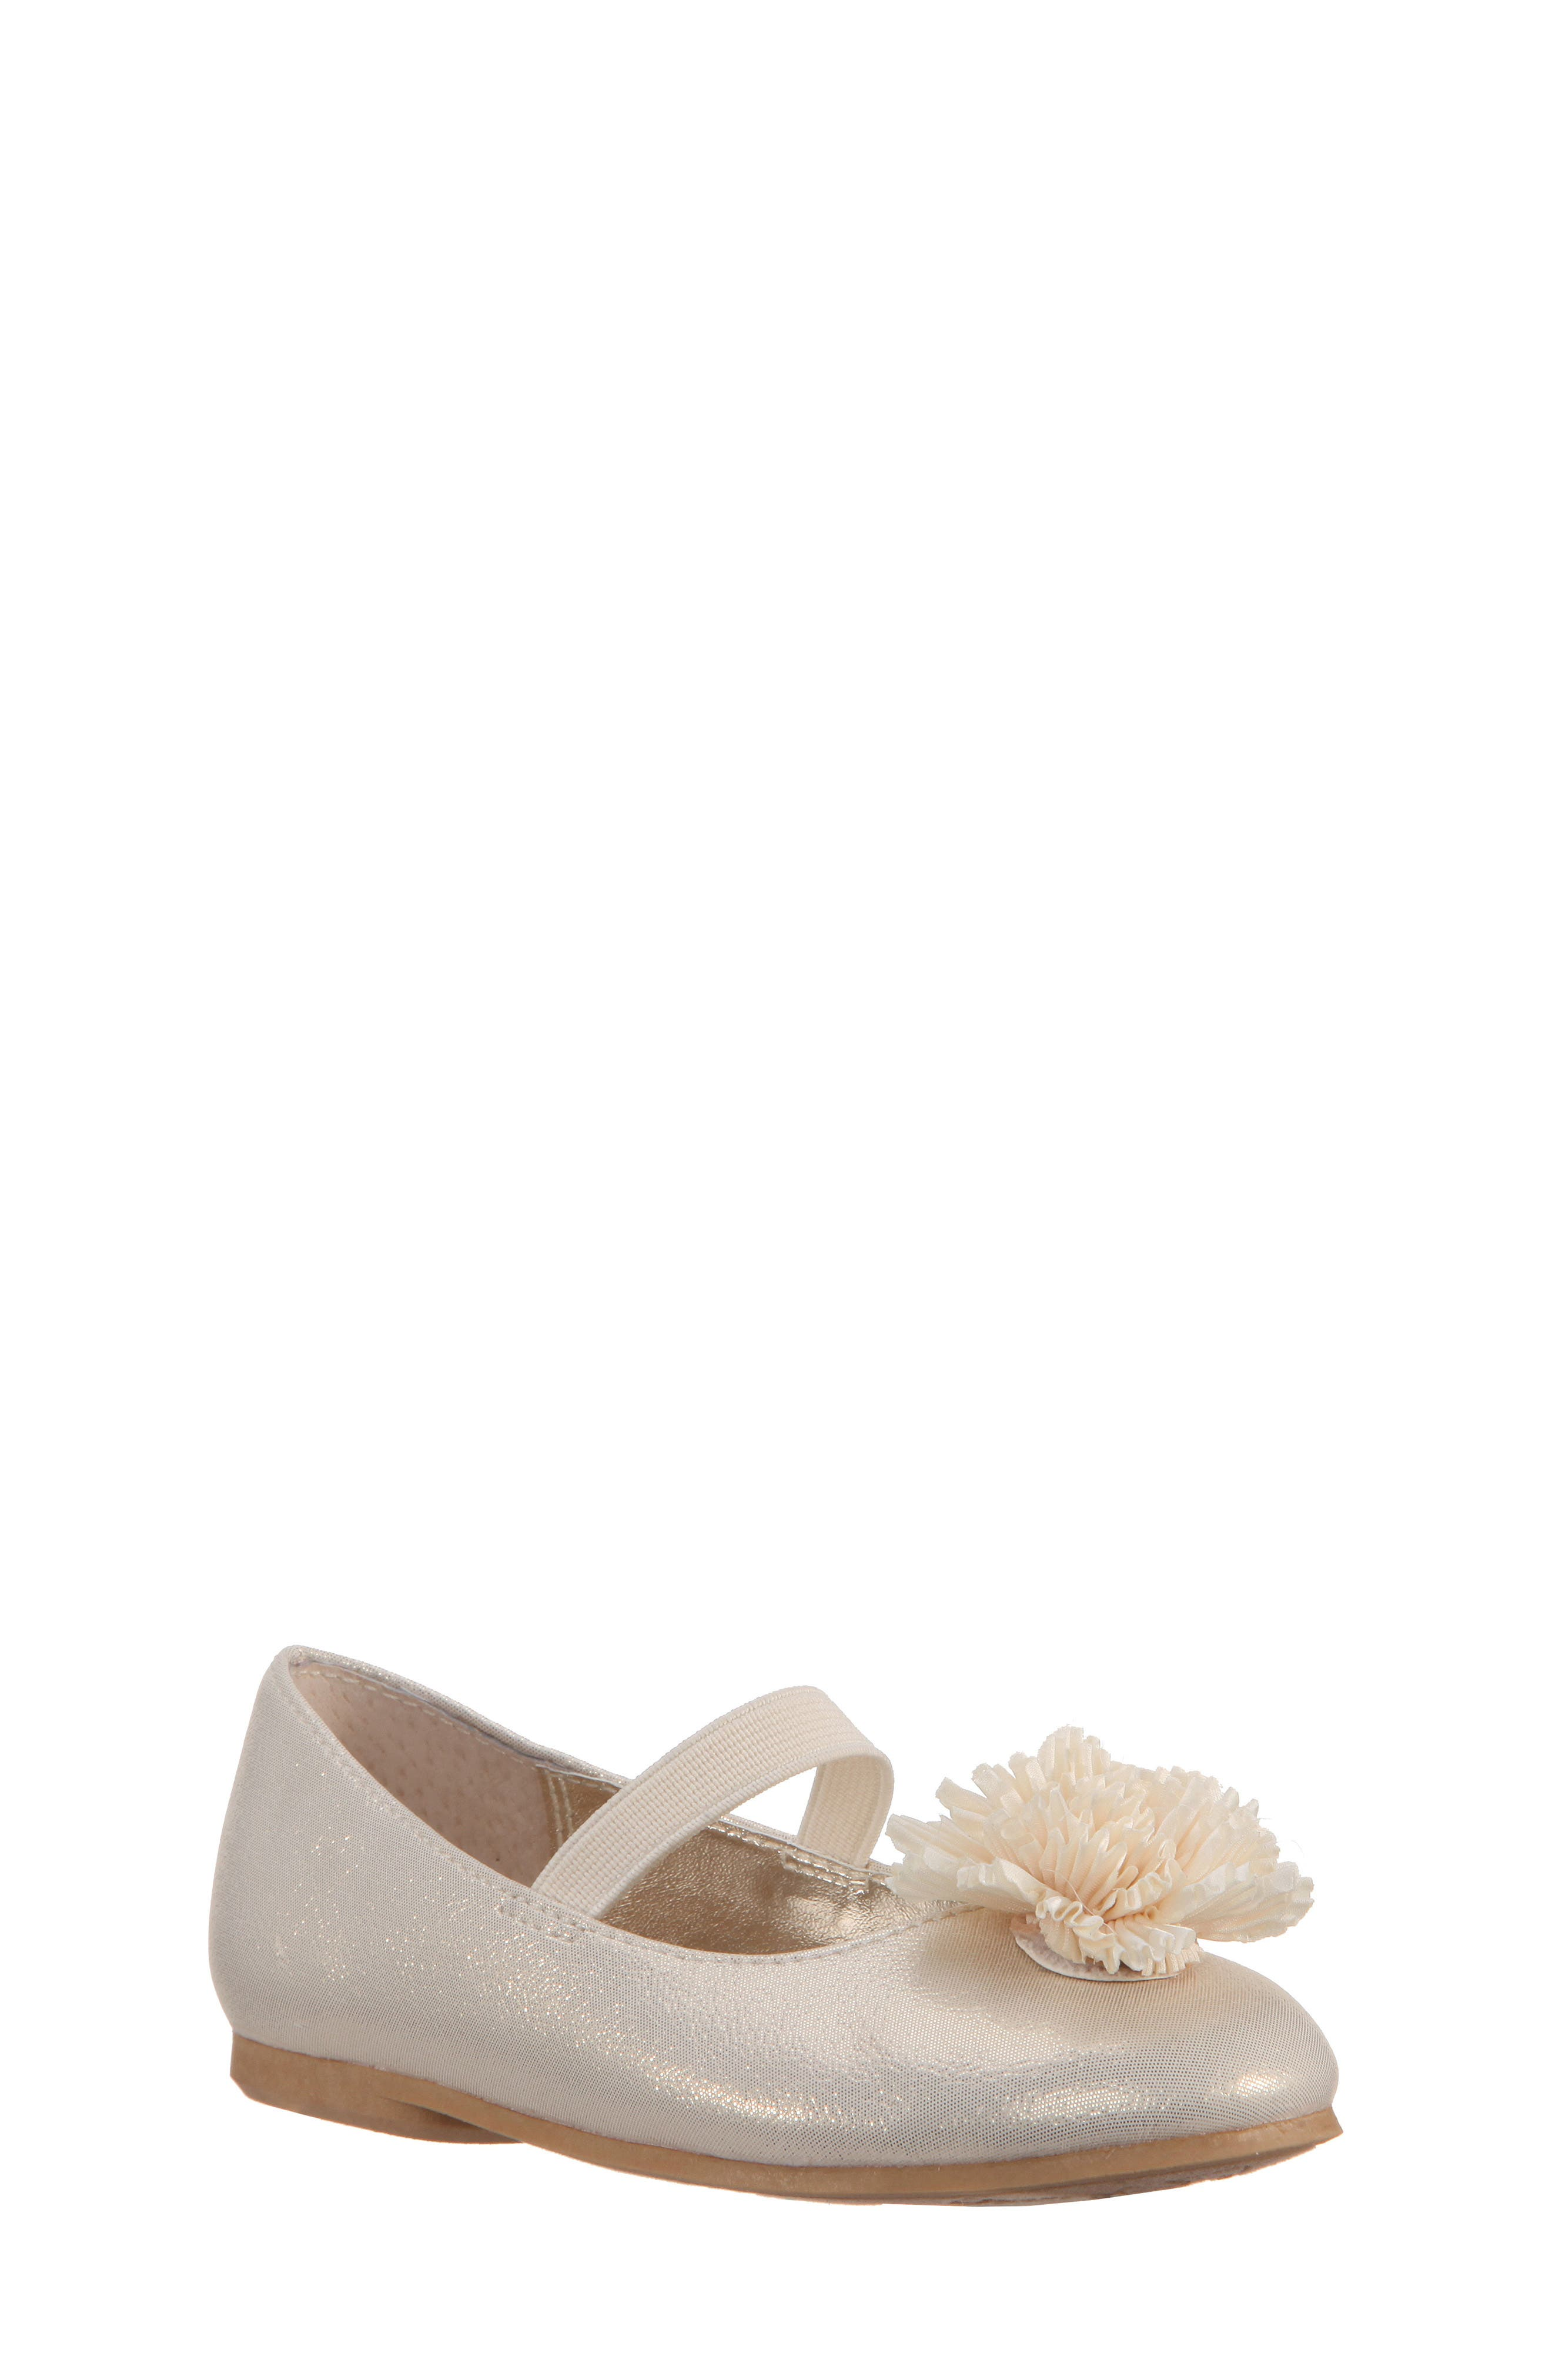 Jemma-T Bow Ballet Flat,                             Main thumbnail 1, color,                             Platino Metallic